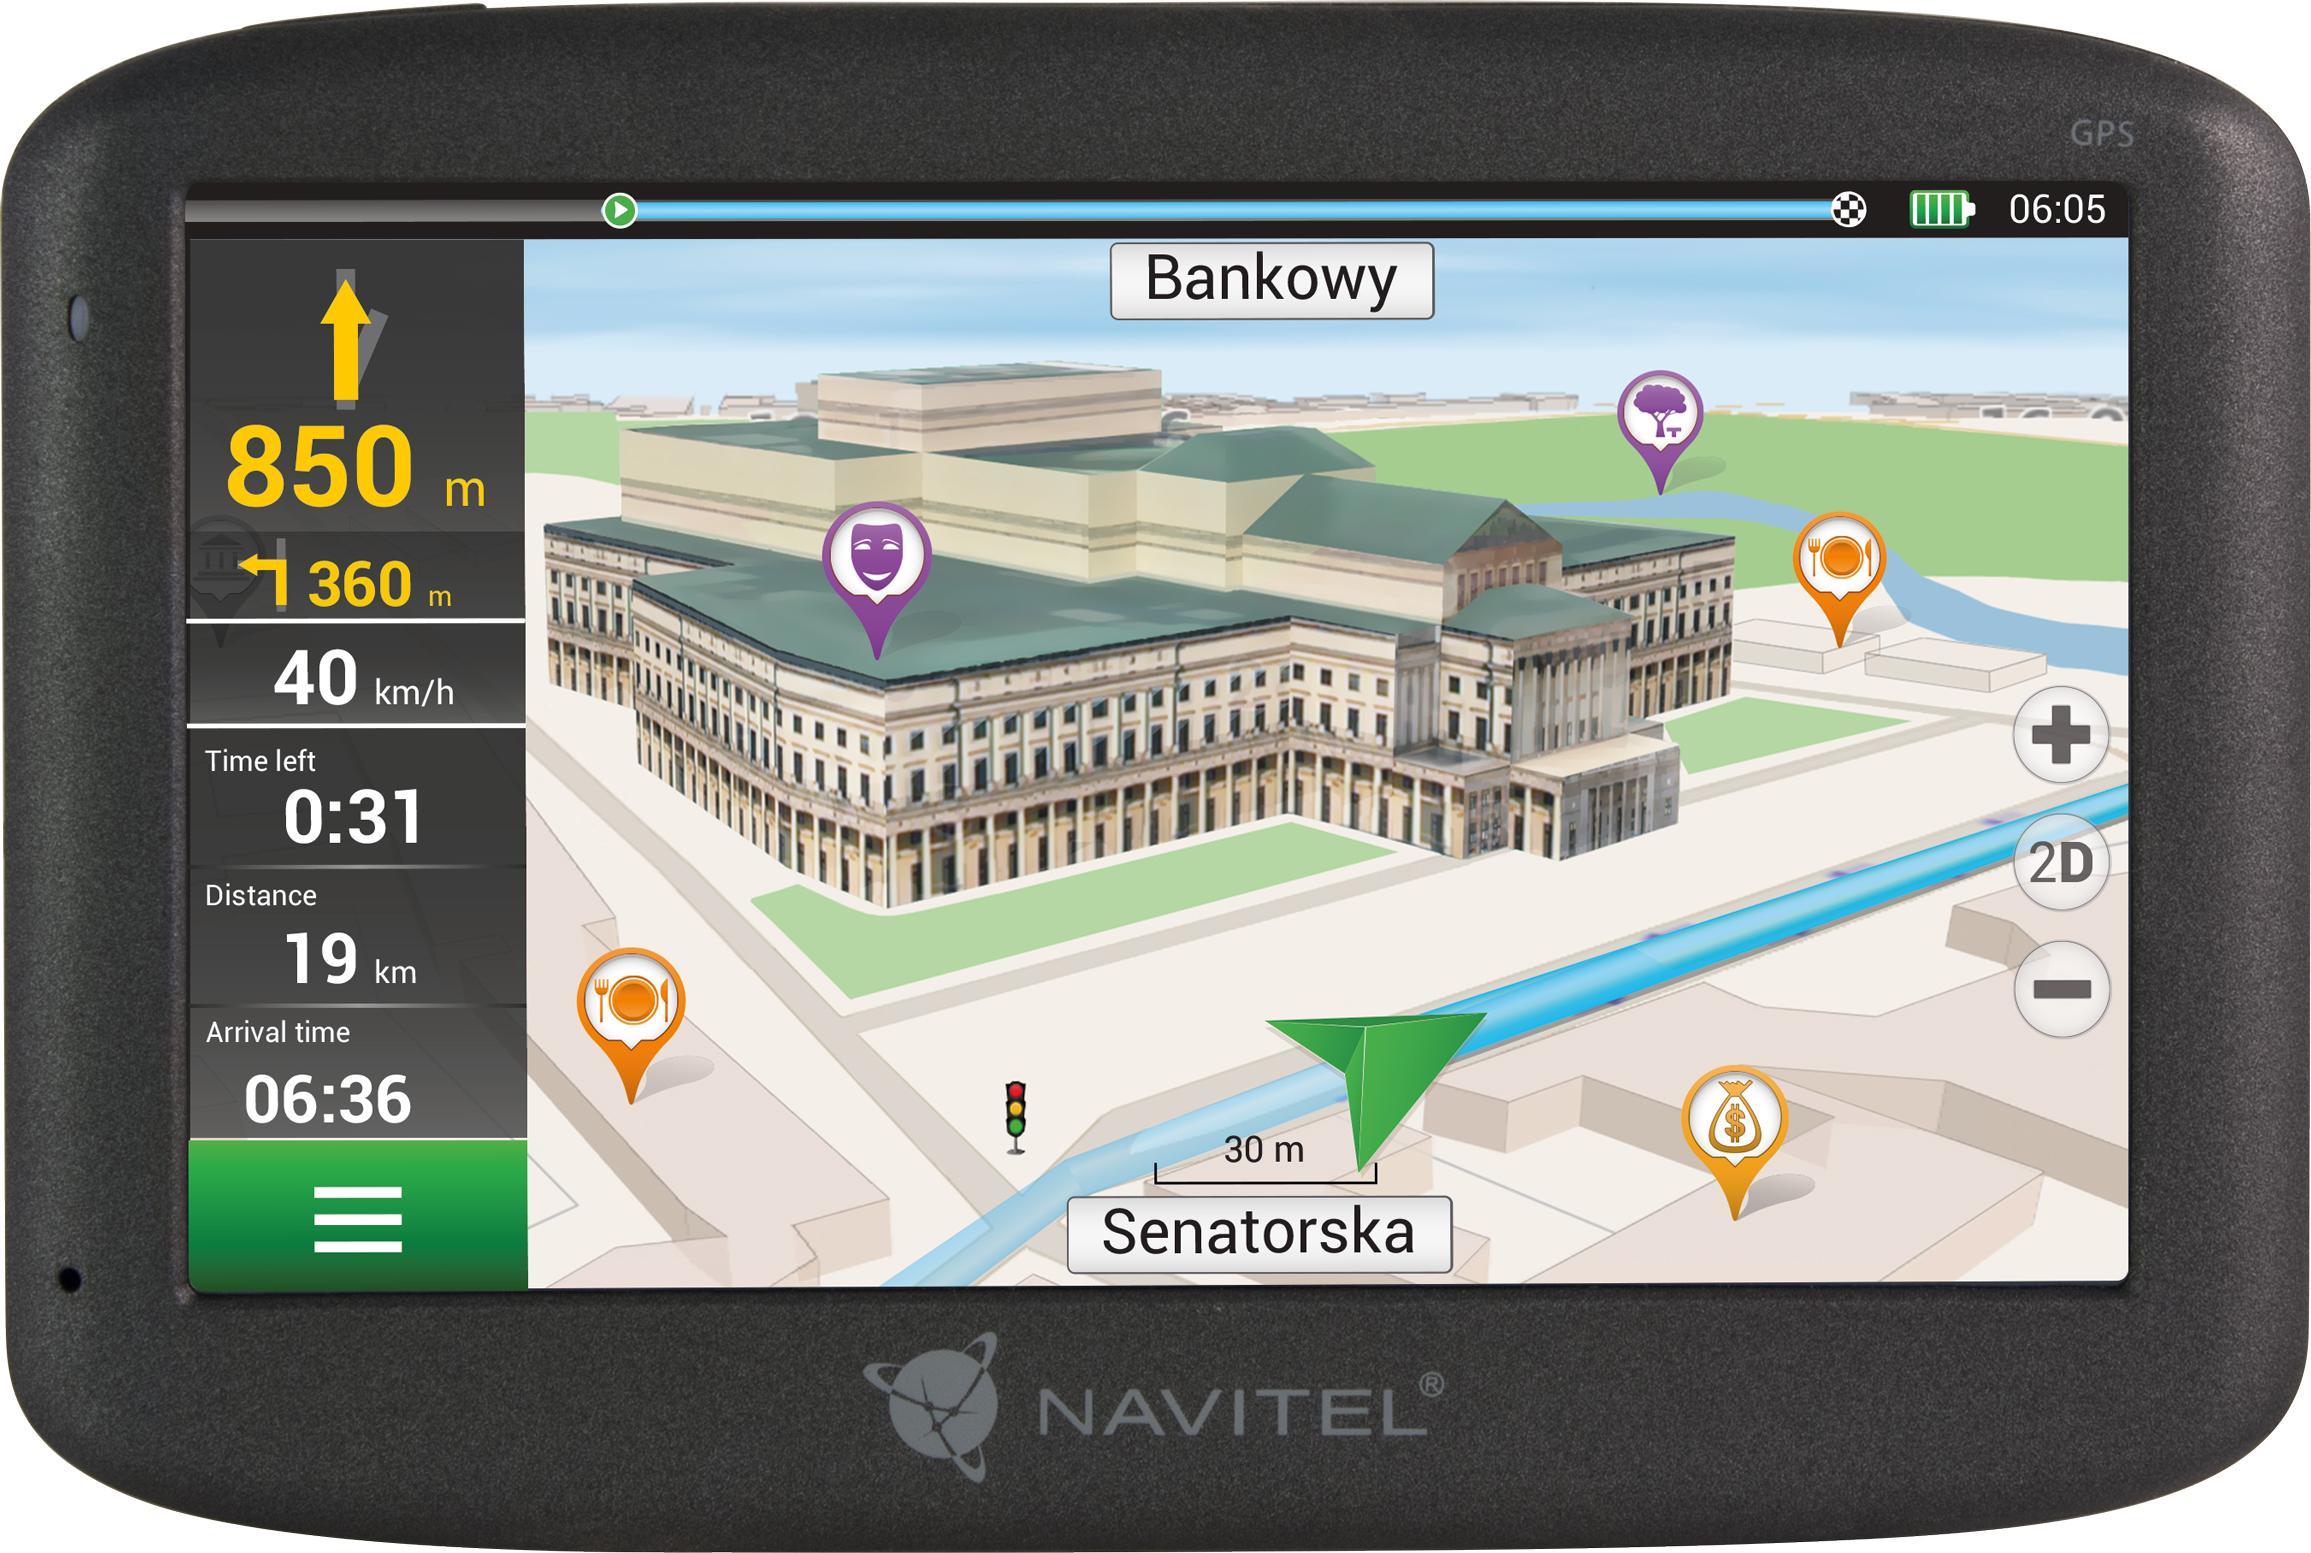 NAVMS400 NAVITEL Wi-Fi: Nee, Windows CE 6.0 Navigatiesysteem NAVMS400